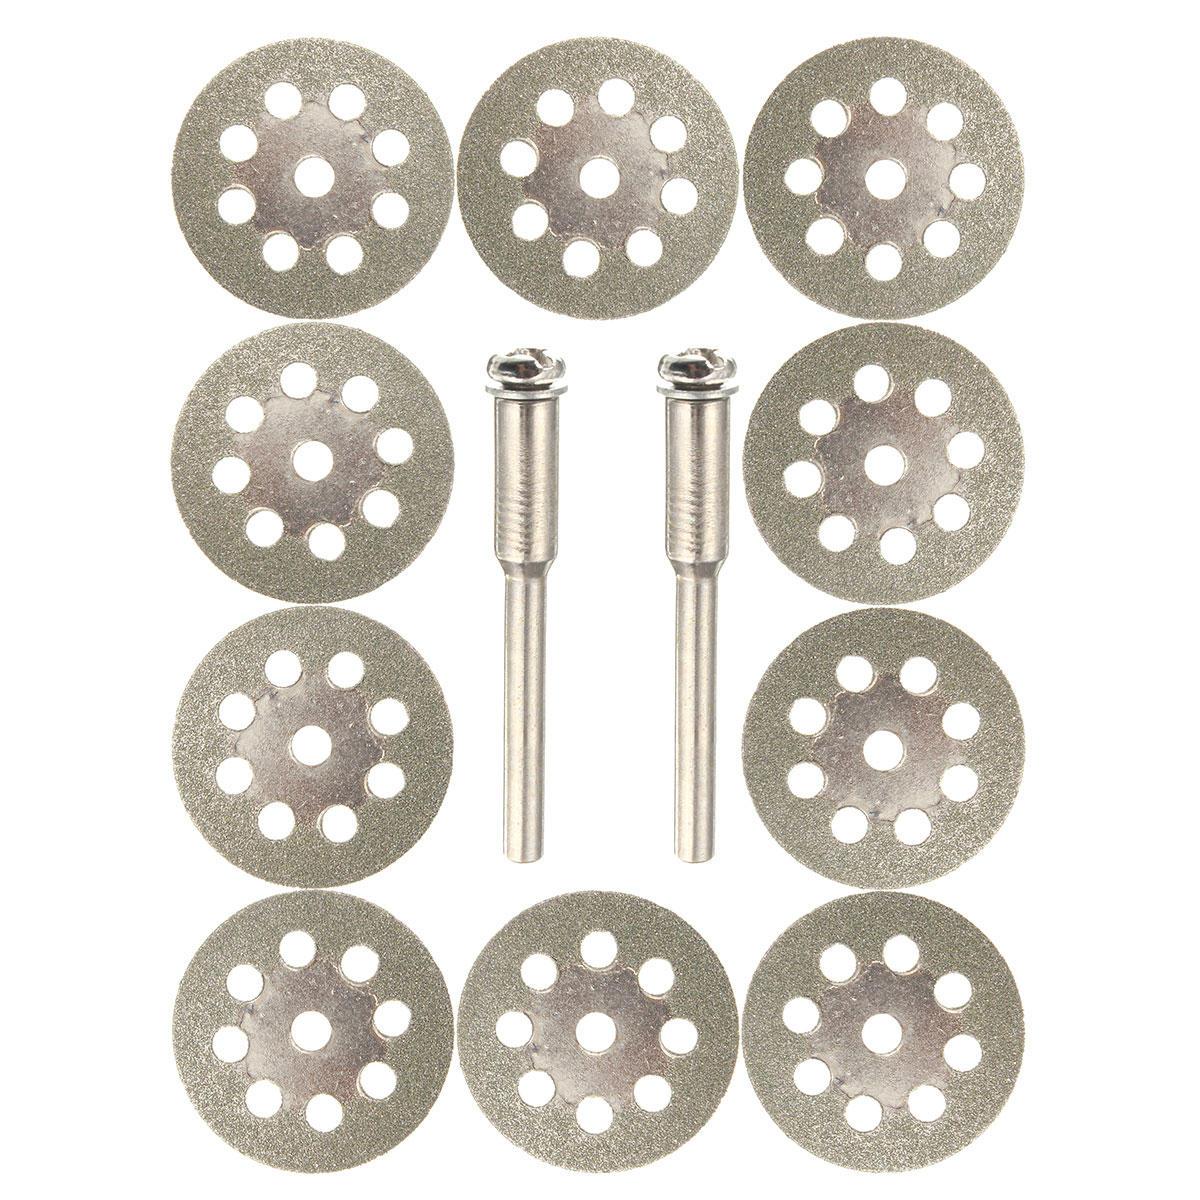 10pcs 22mm Diamond Coated Saw Blade 9 Holes Cutting Discs with 2pcs Mandrel for Dremel